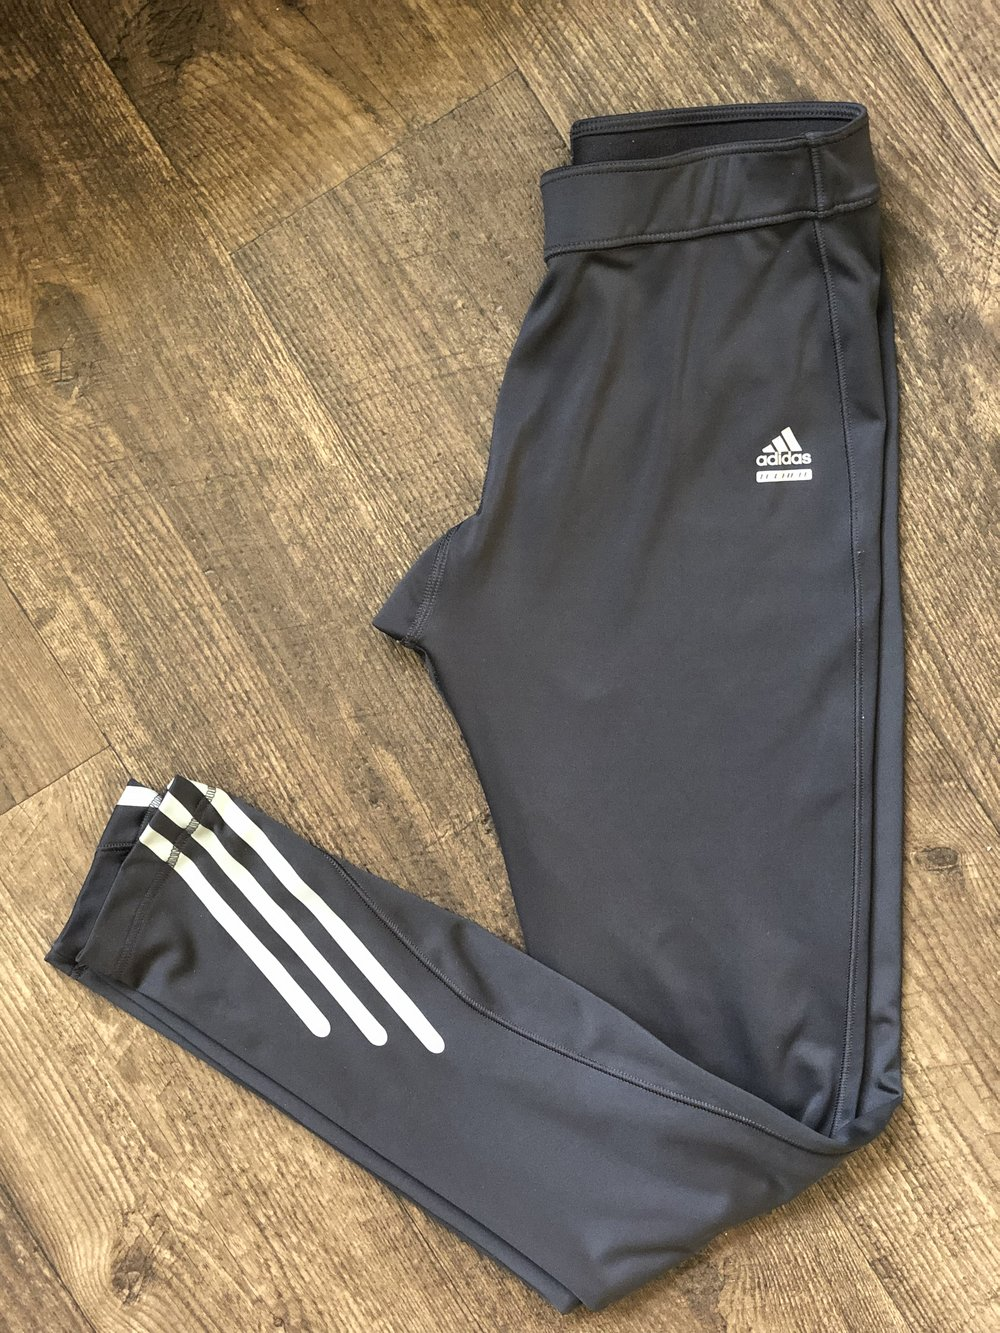 Adidas Running Pant Mid Rise // $20